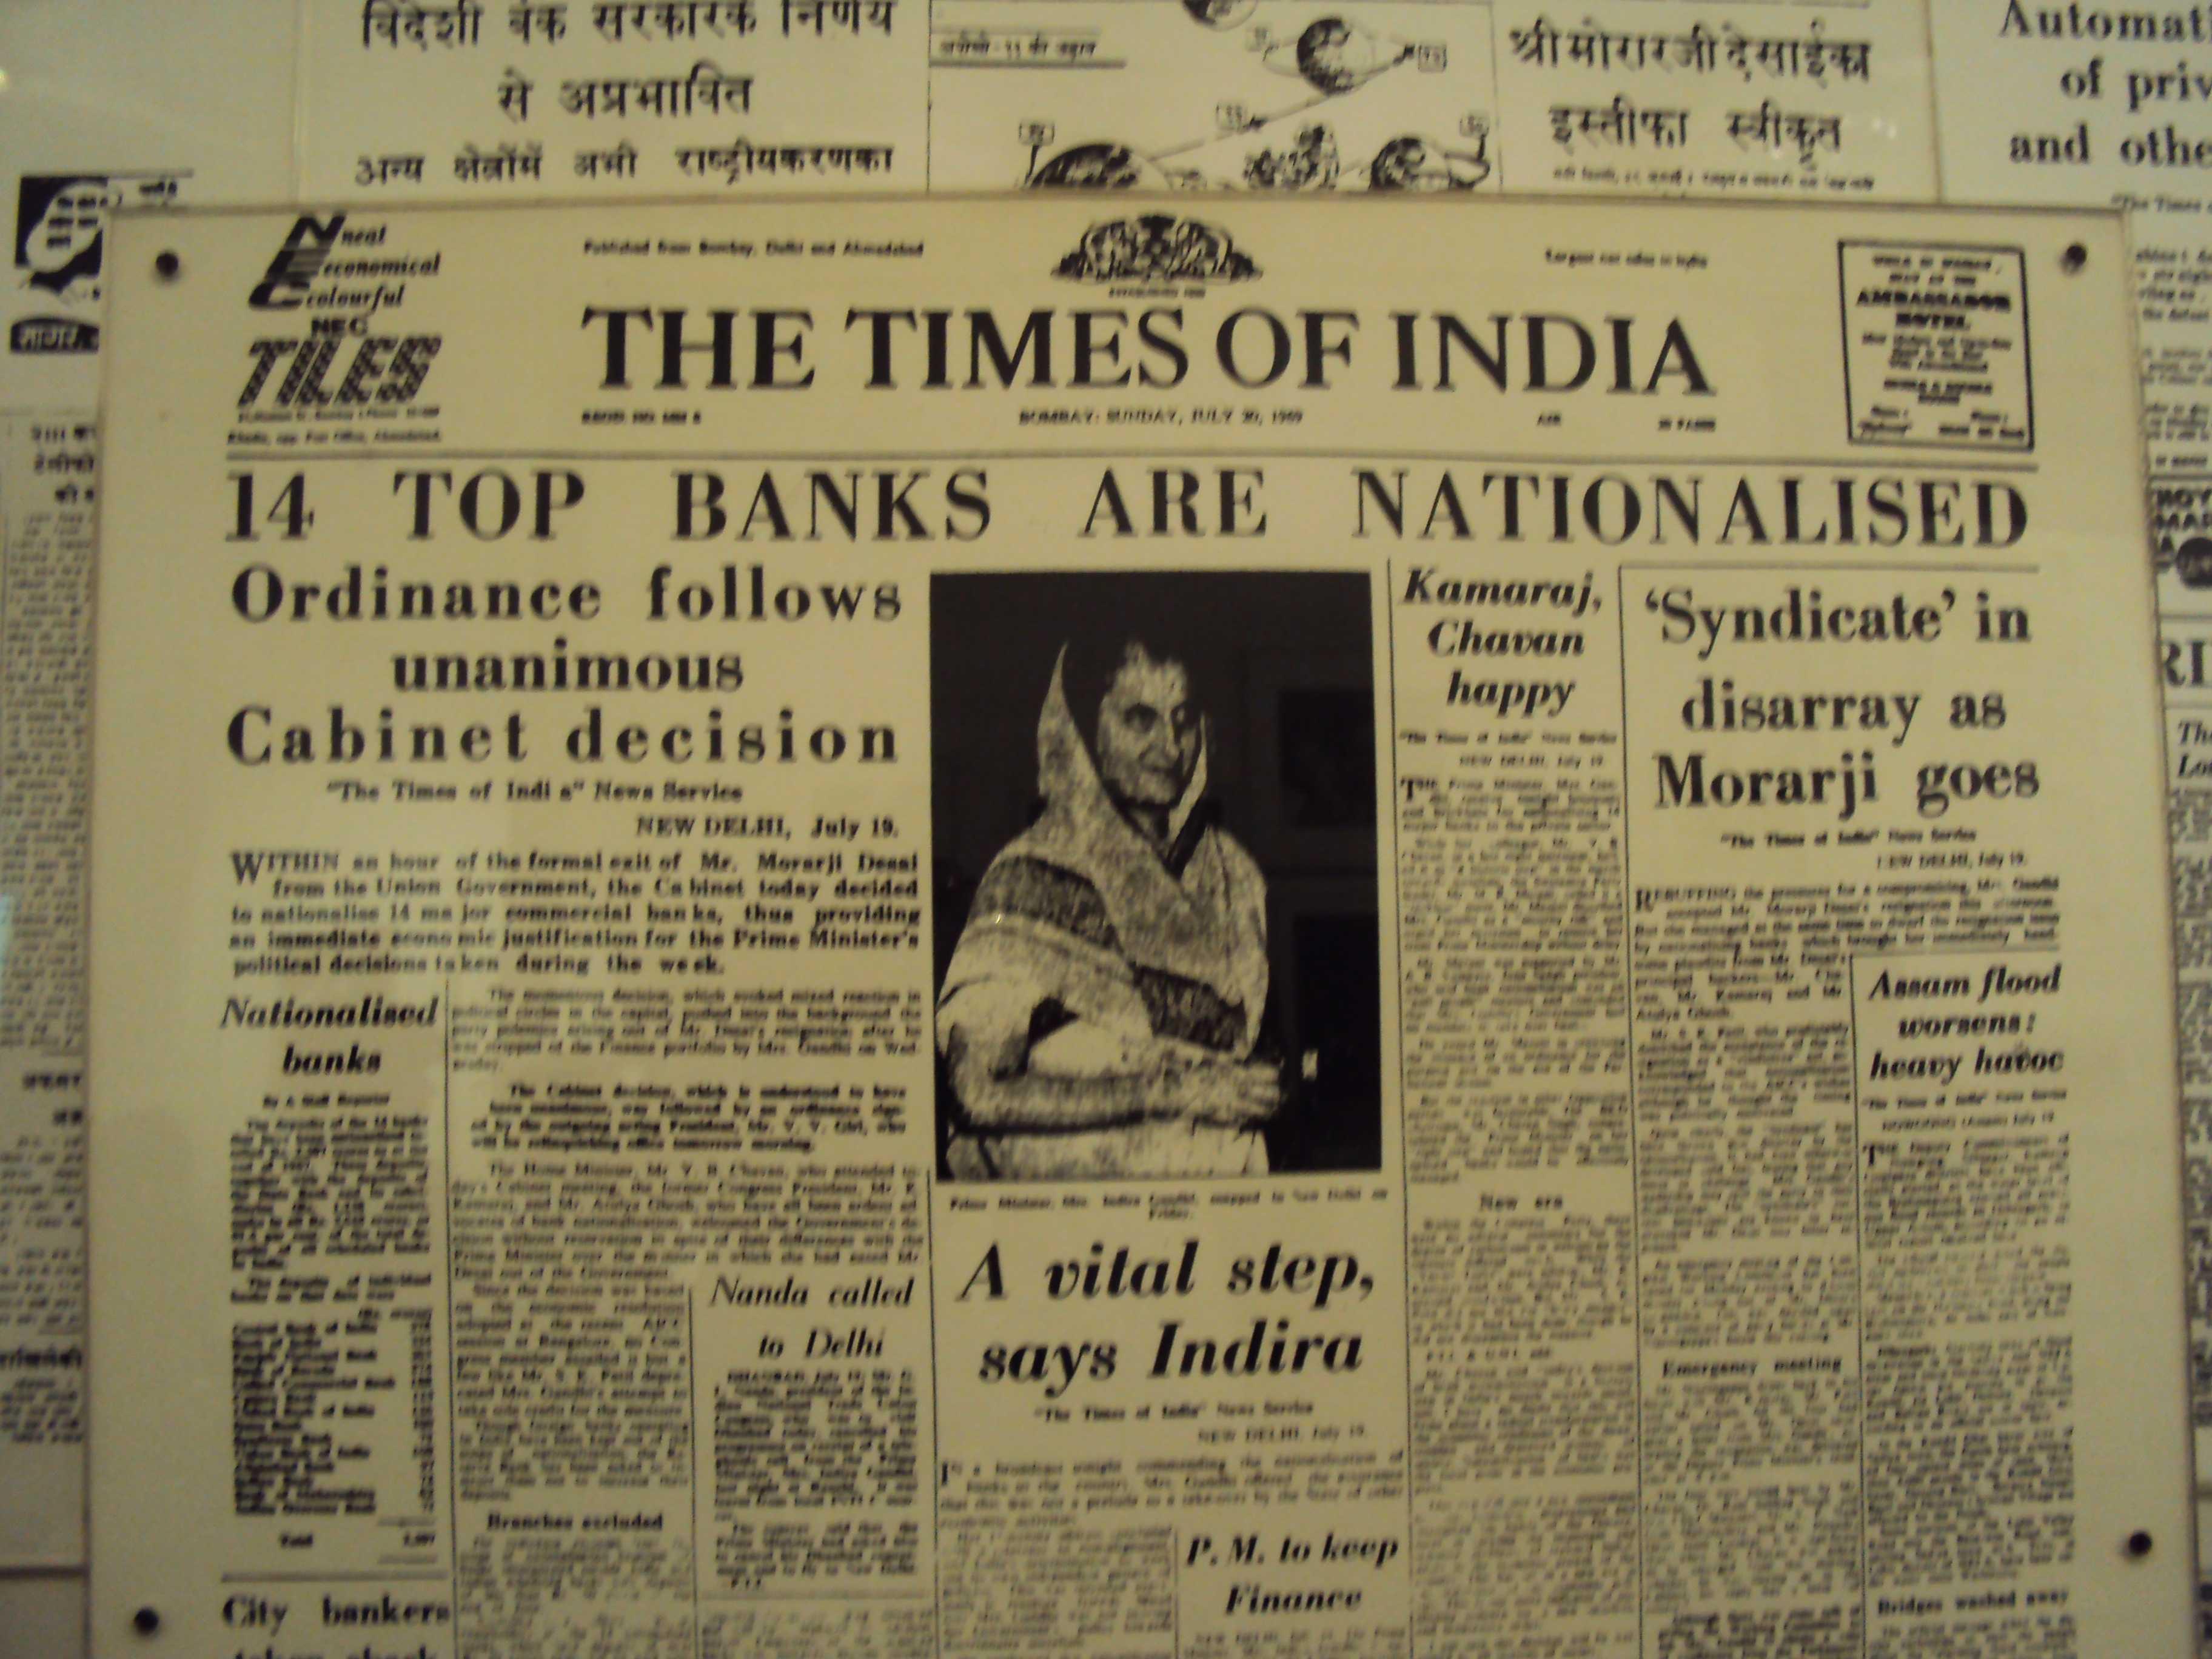 Natiionalization of banks in India-fnbworld